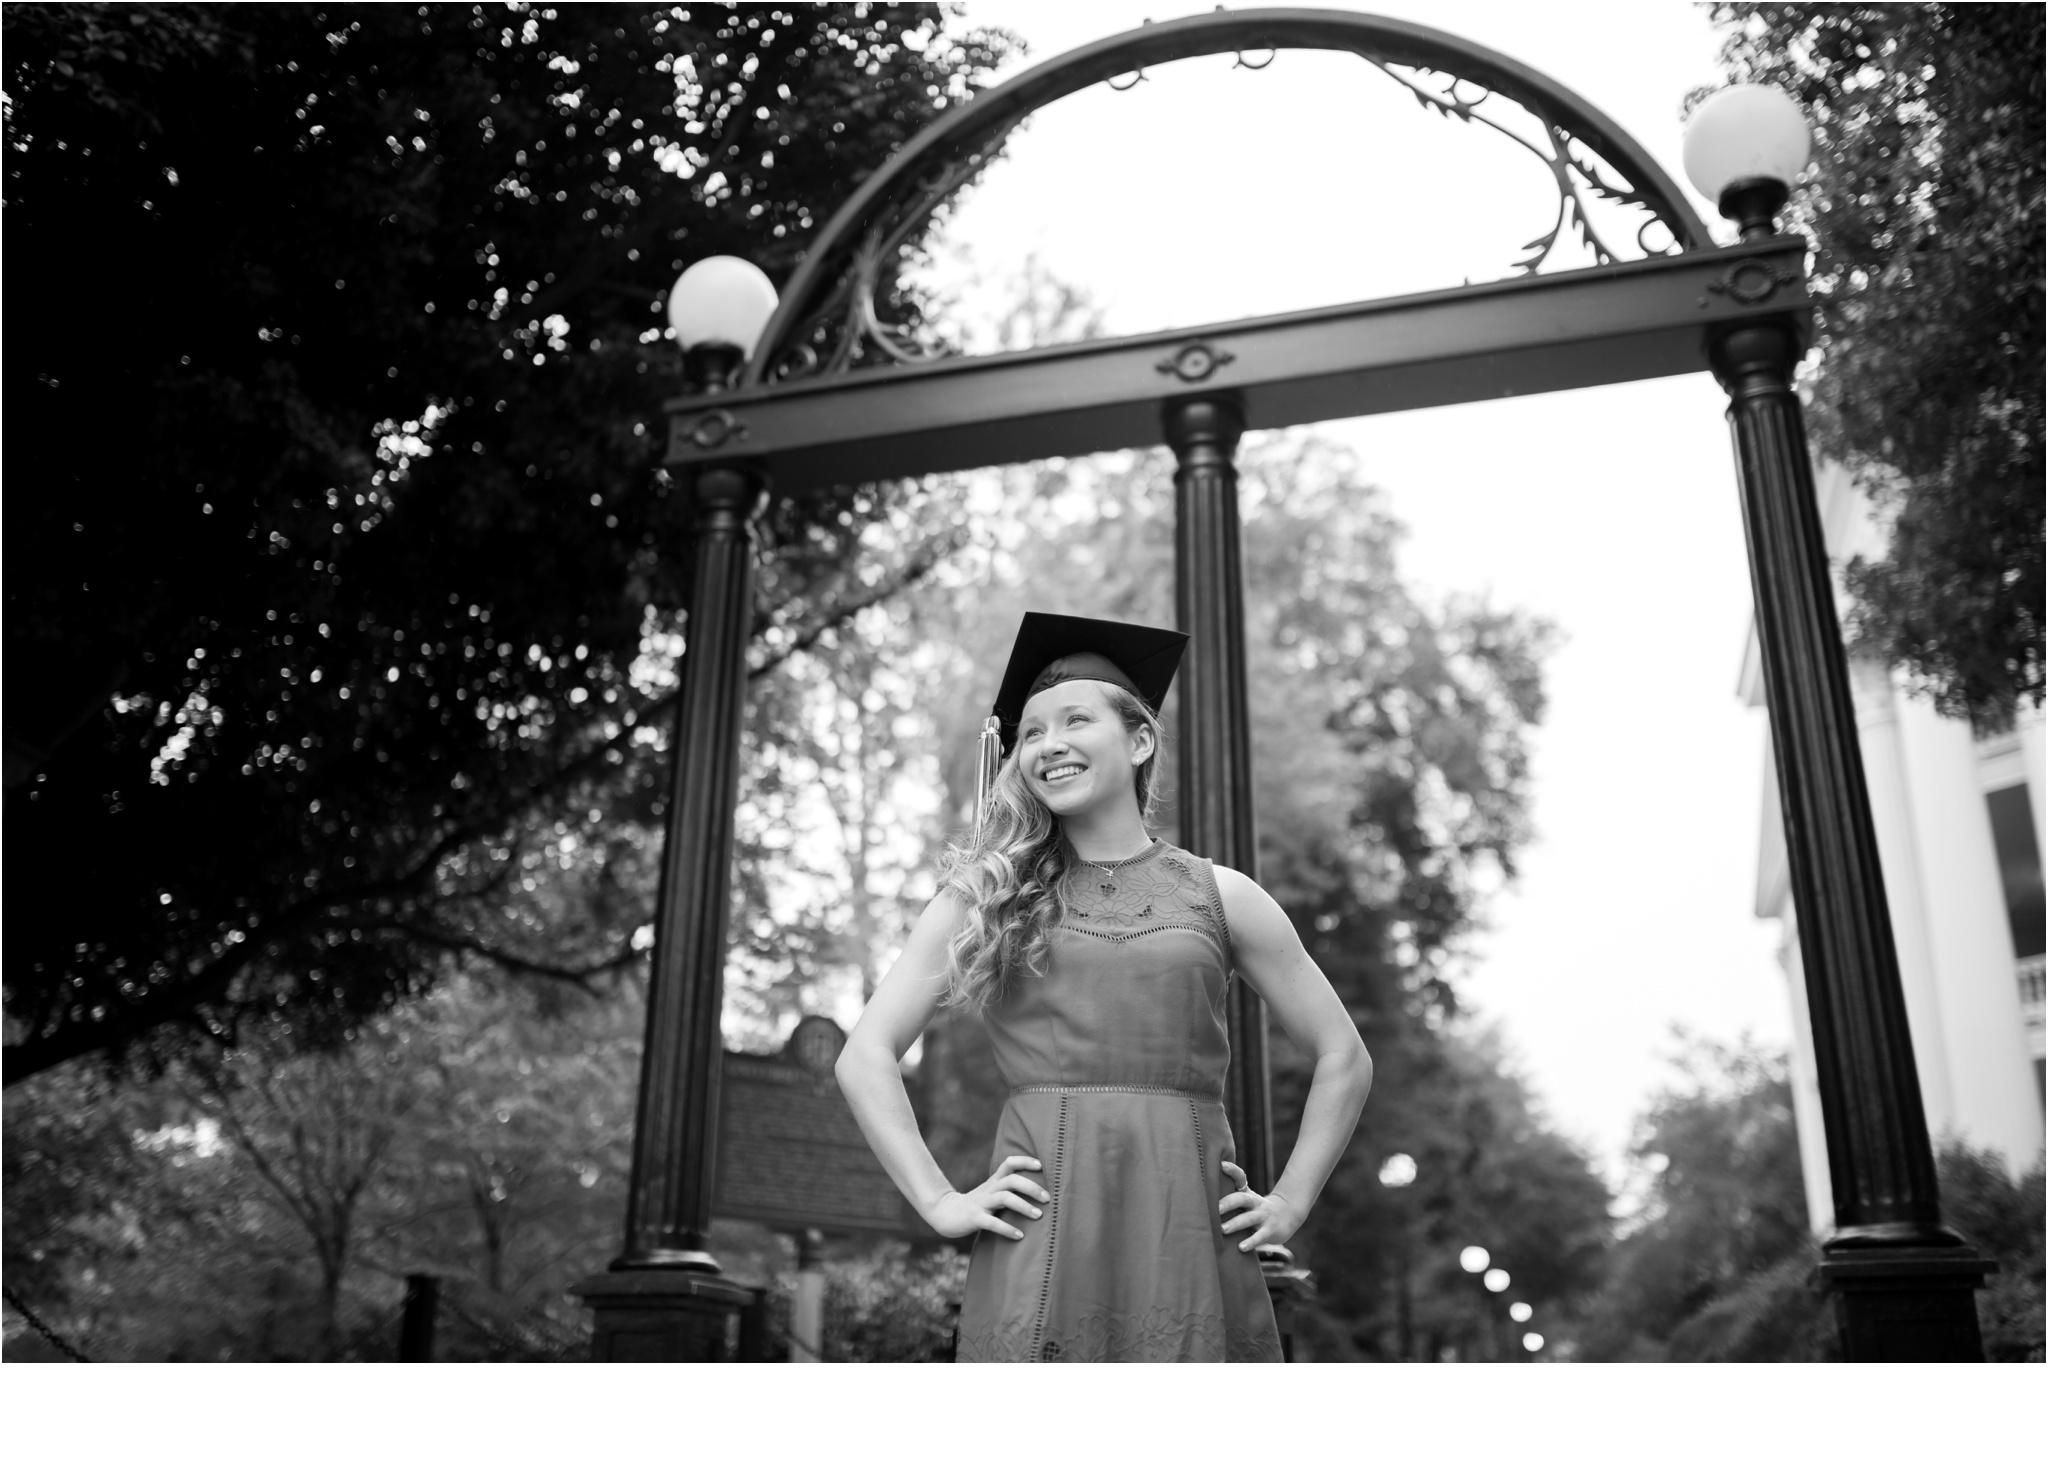 Rainey_Gregg_Photography_St._Simons_Island_Georgia_California_Wedding_Portrait_Photography_0286.jpg